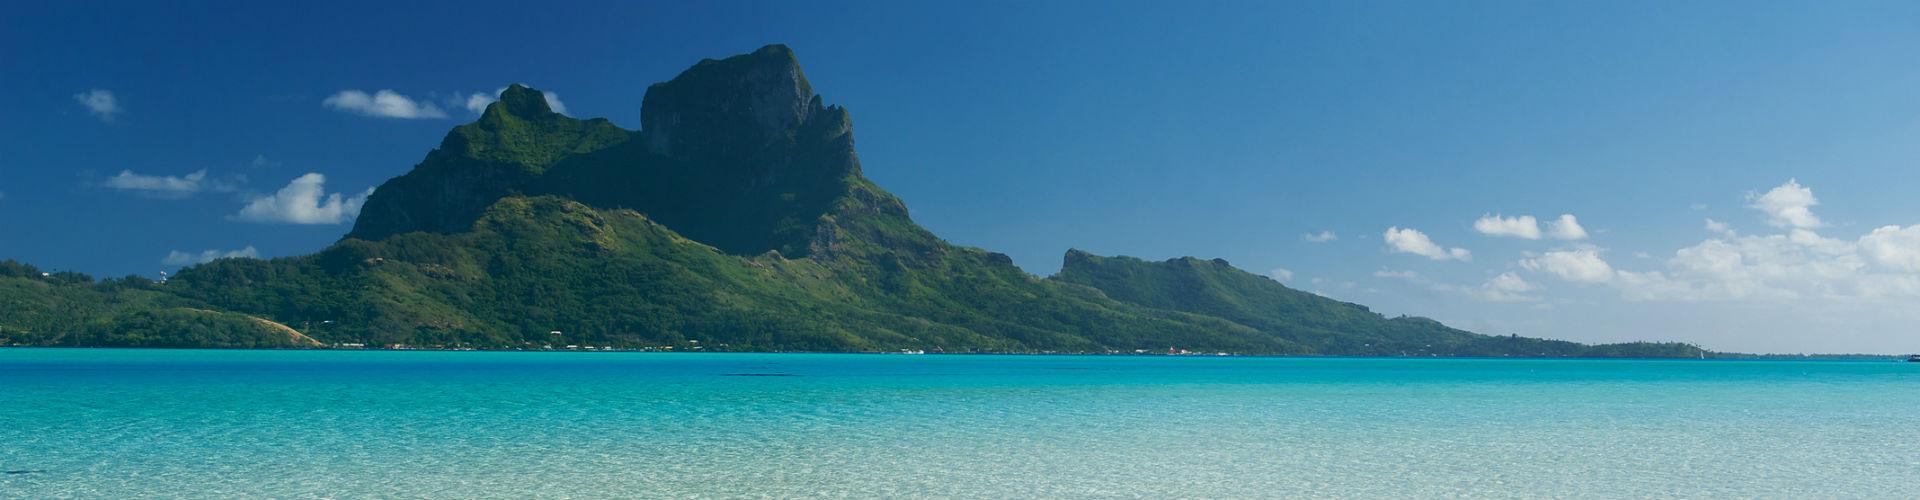 BOB-Landscape-Cristal-Lagoon_ok